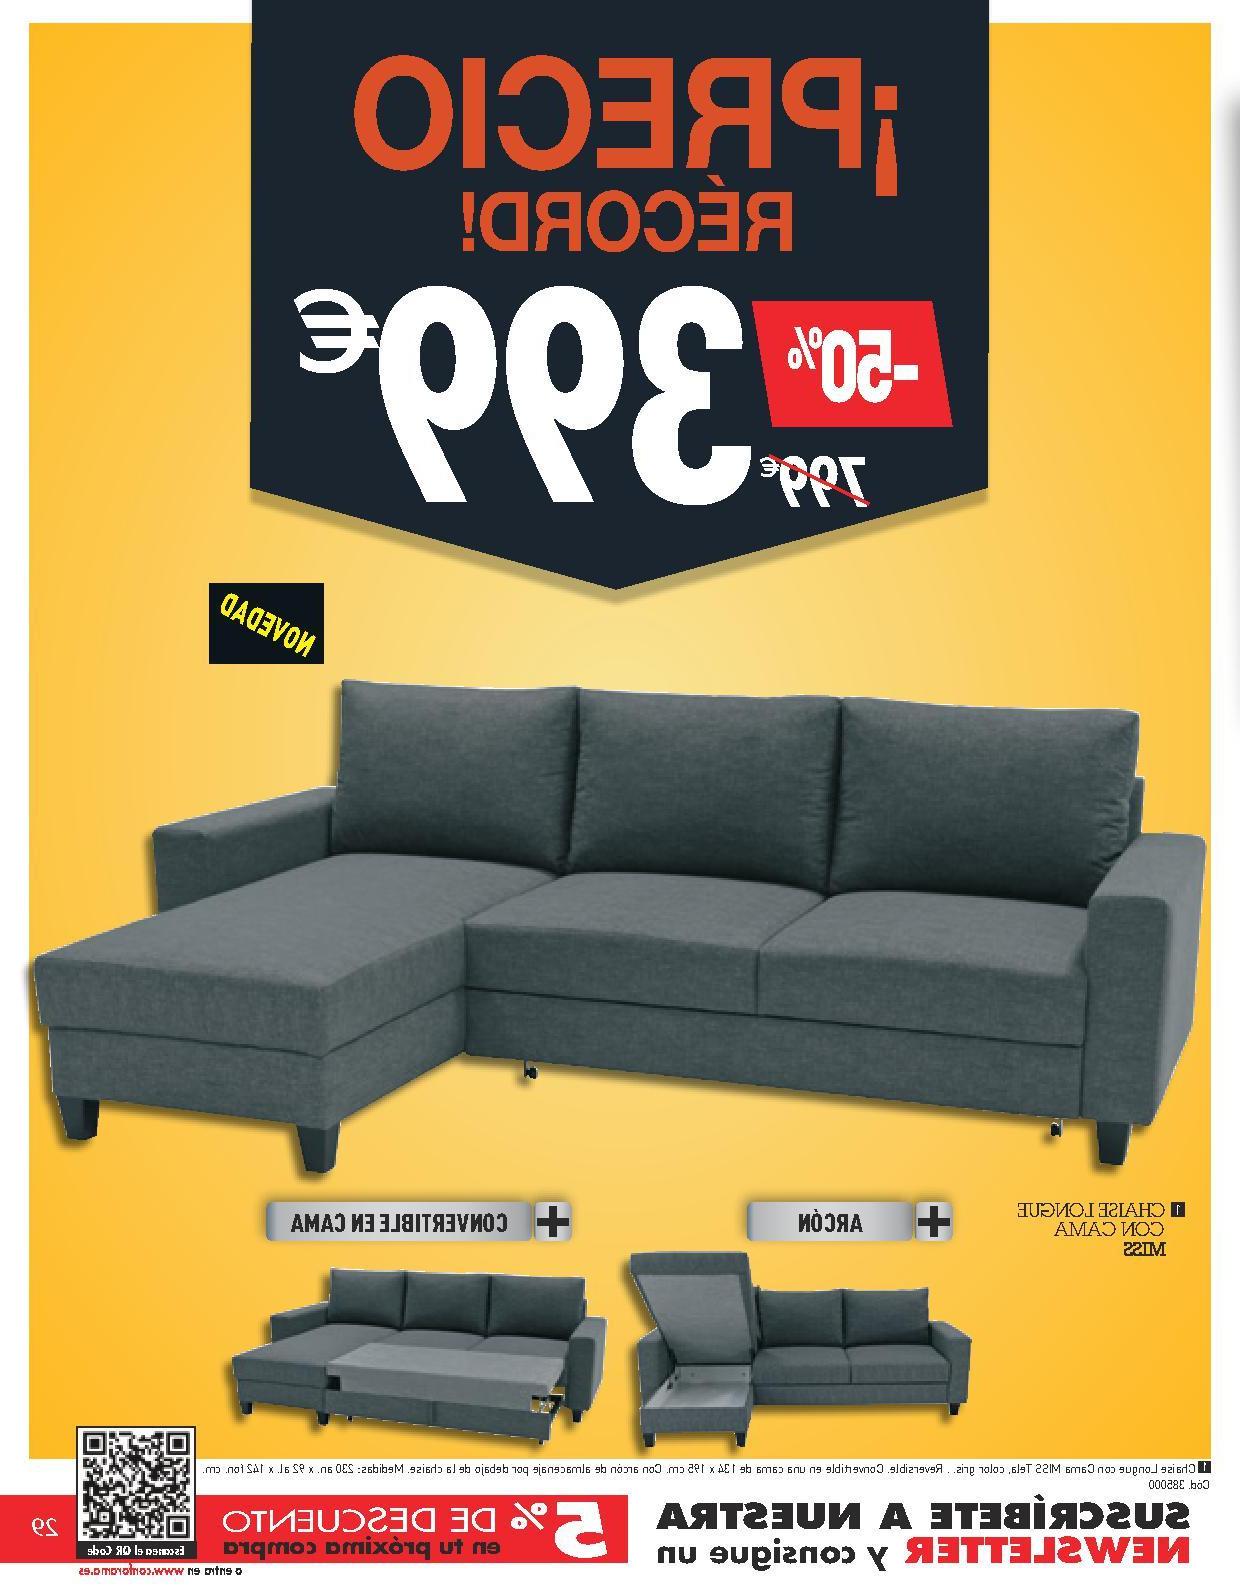 Ofertas sofas Conforama Ipdd Ofertas sofas Conforama sofas Dos Plazas Conforama Beautiful sofa